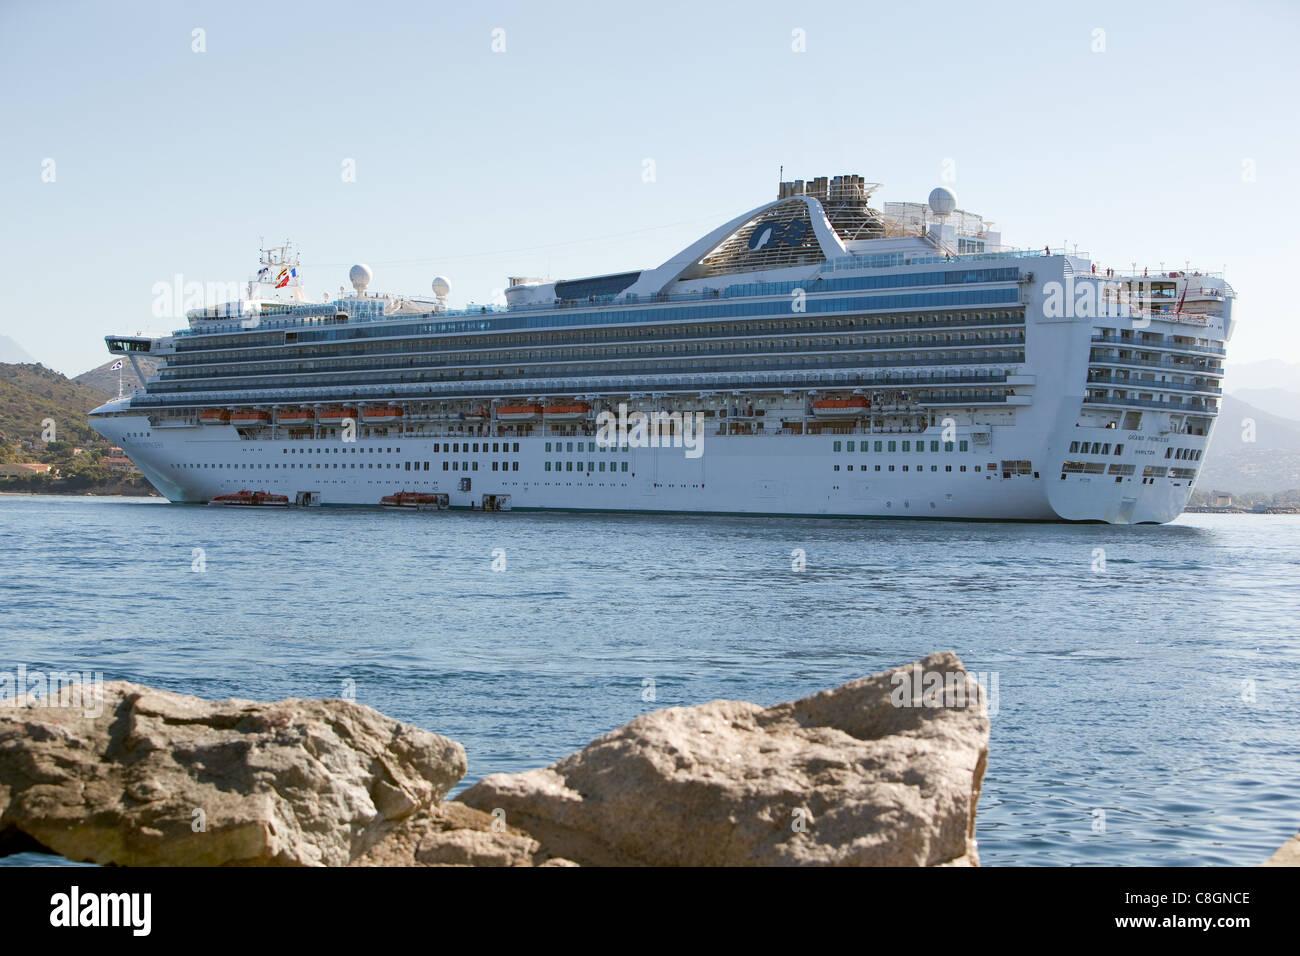 De passageiros do navio de cruzeiro Grand